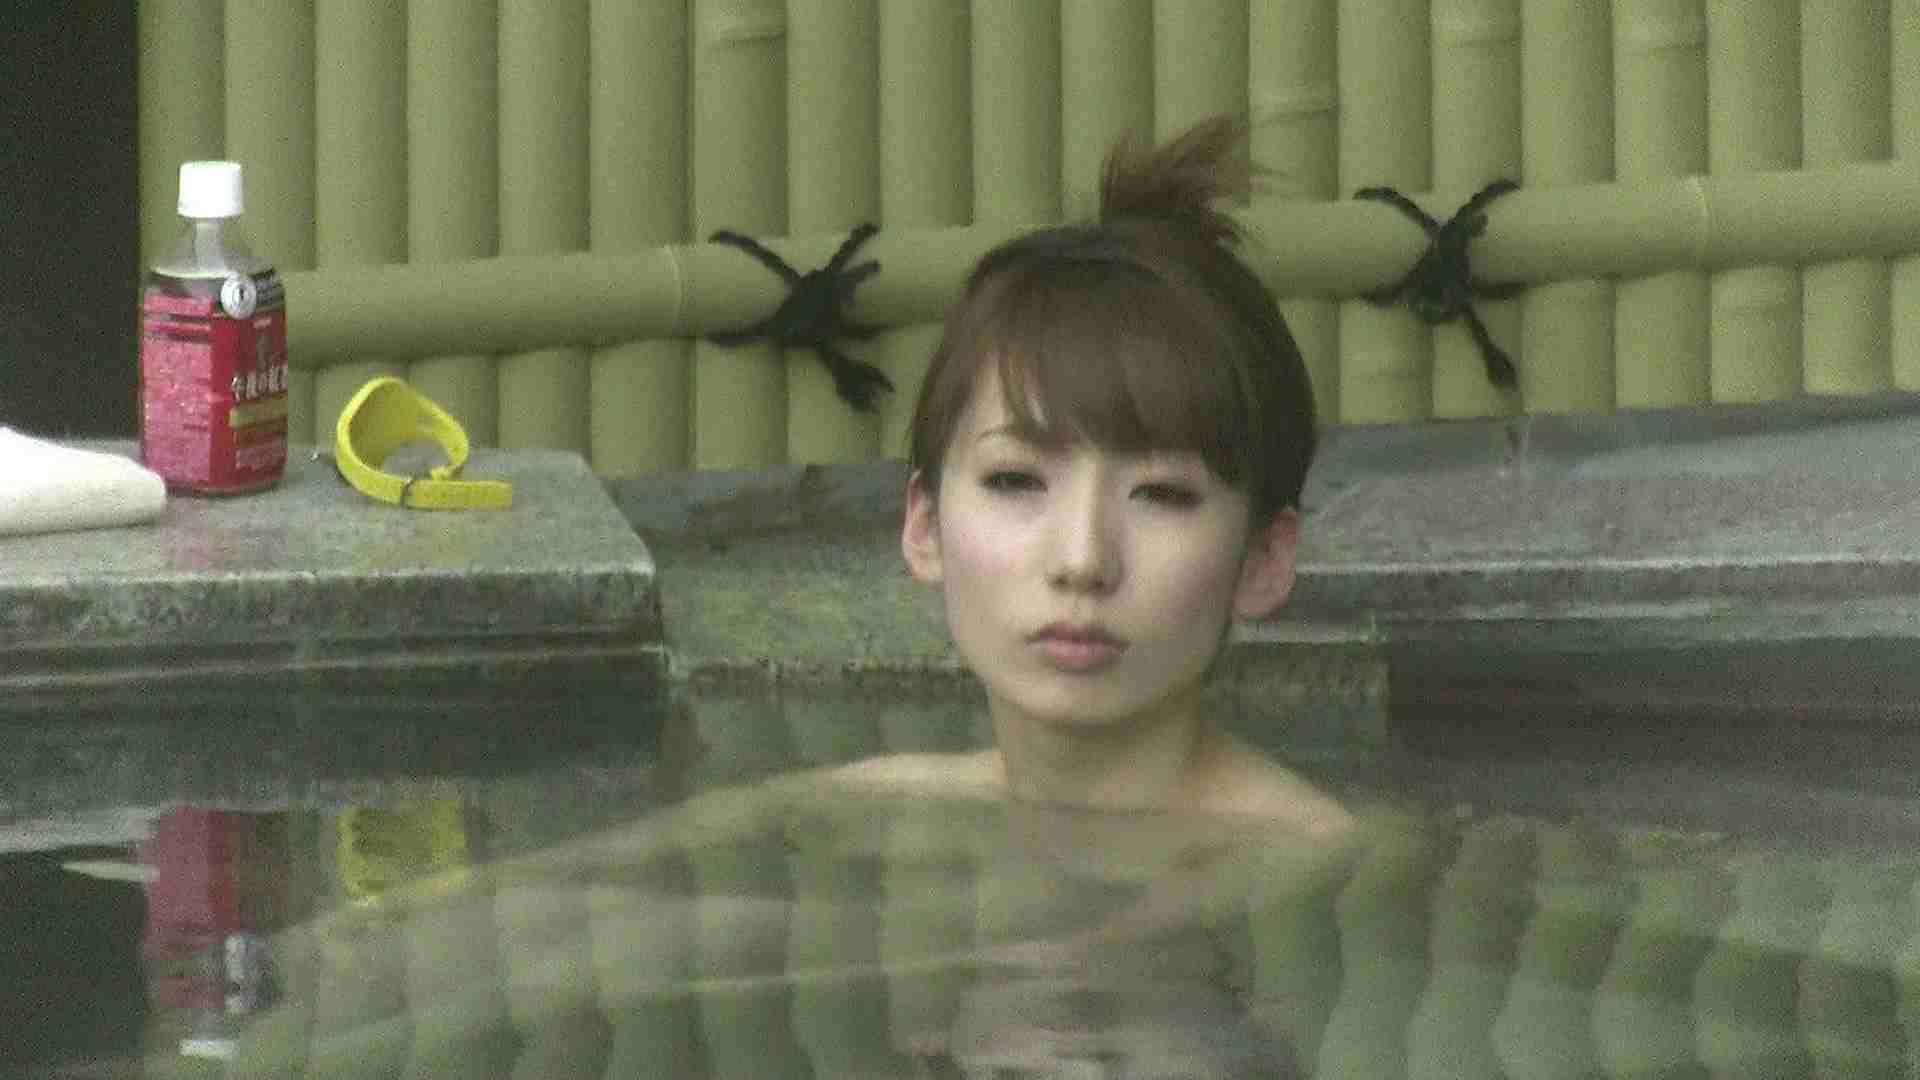 Aquaな露天風呂Vol.208 盗撮 隠し撮りオマンコ動画紹介 85画像 32